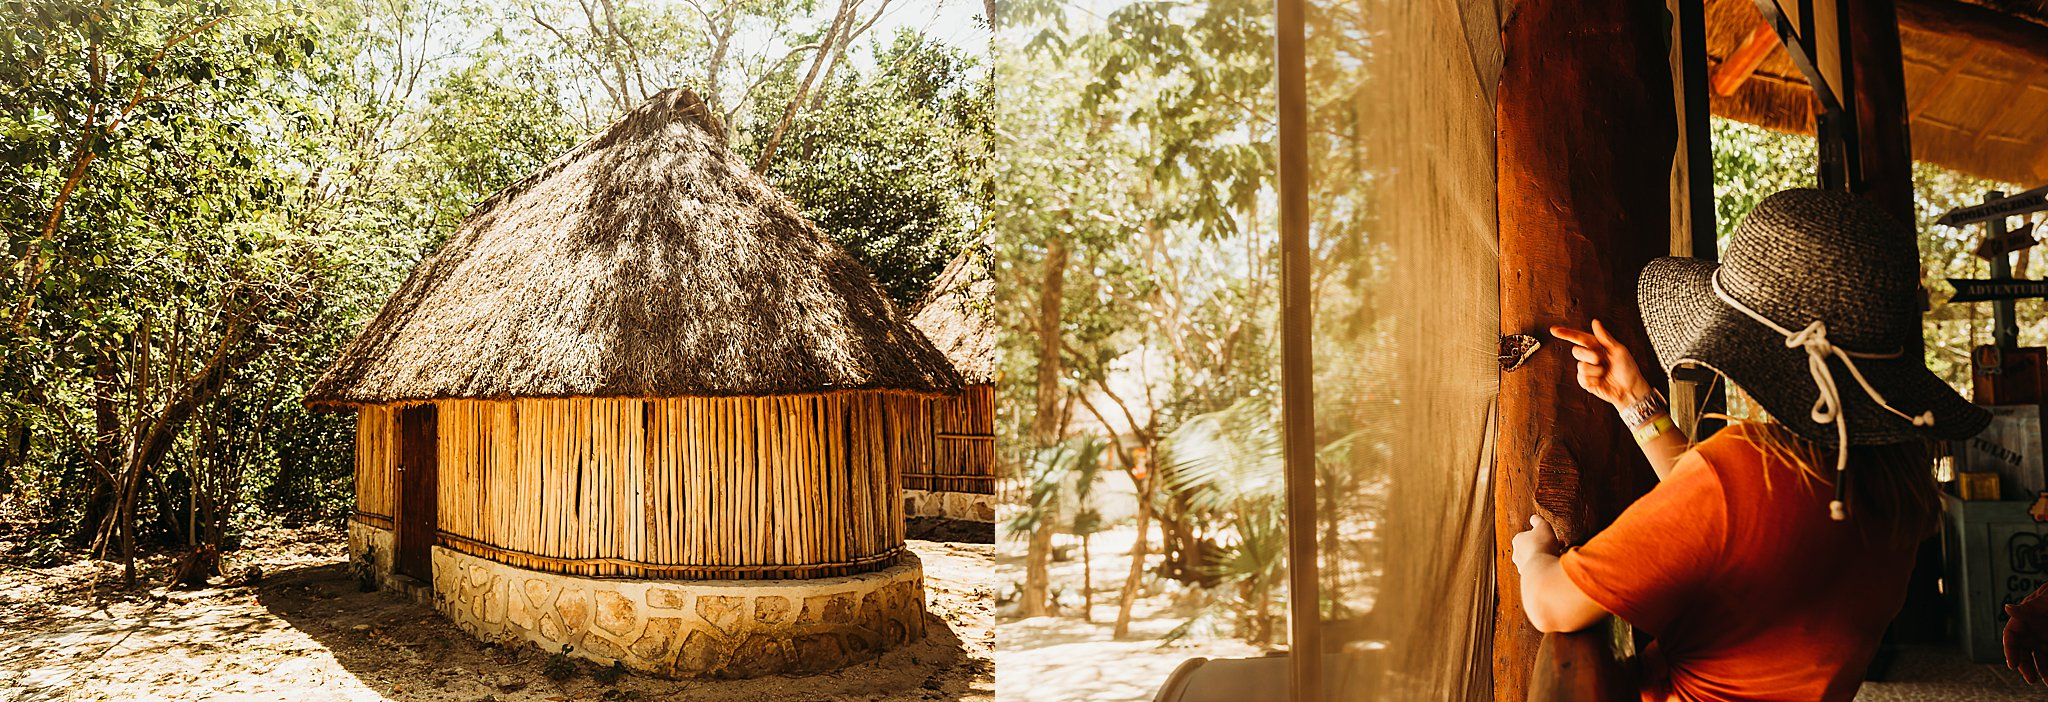 Mexico Vacation 2019 Anna Hurley Photography 69.jpg